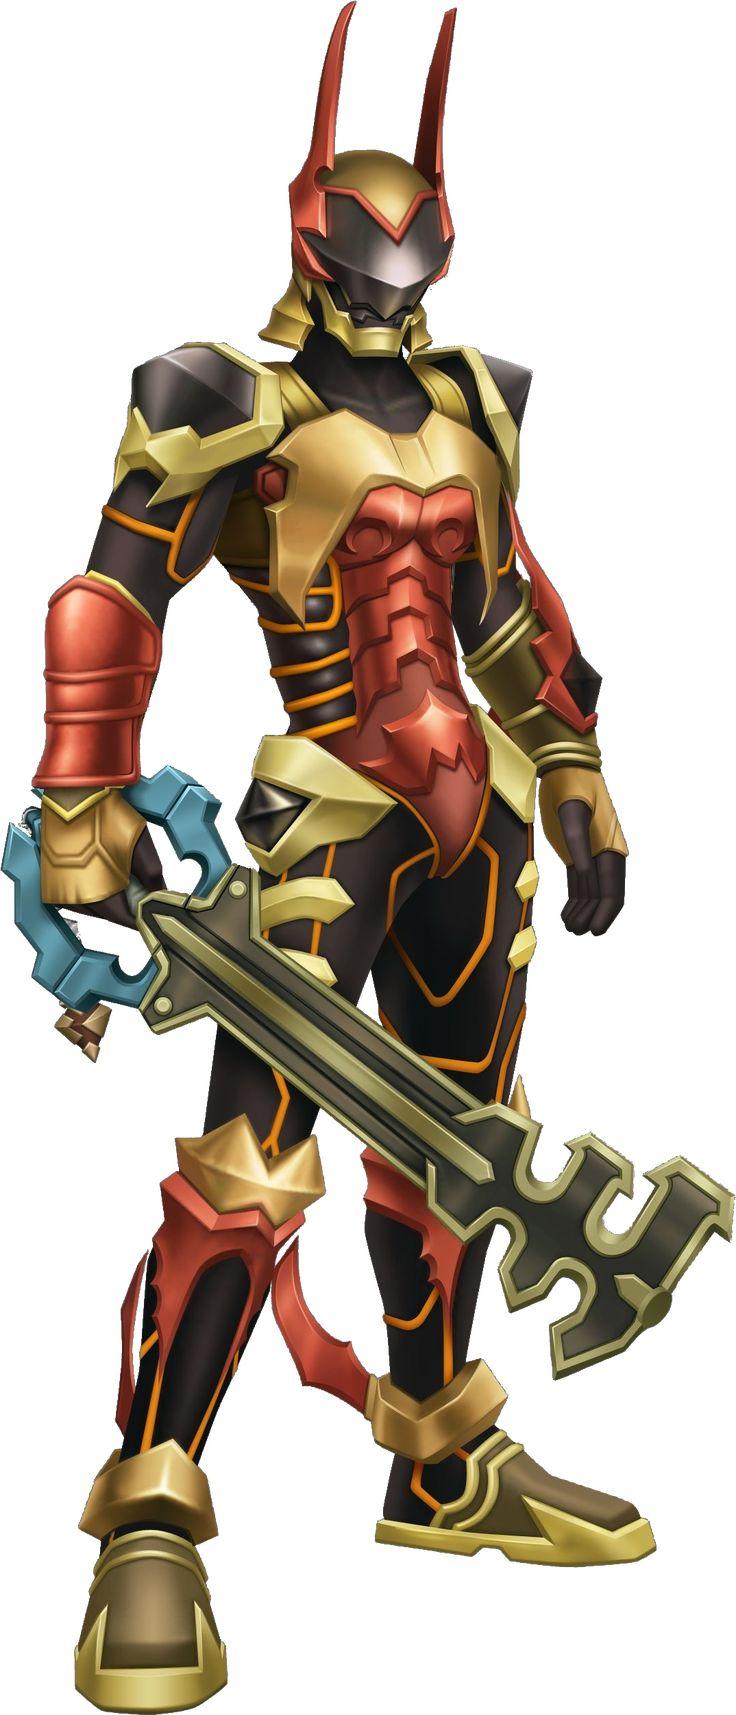 kingdom hearts terra | Kingdom Hearts Terra Terra in armor